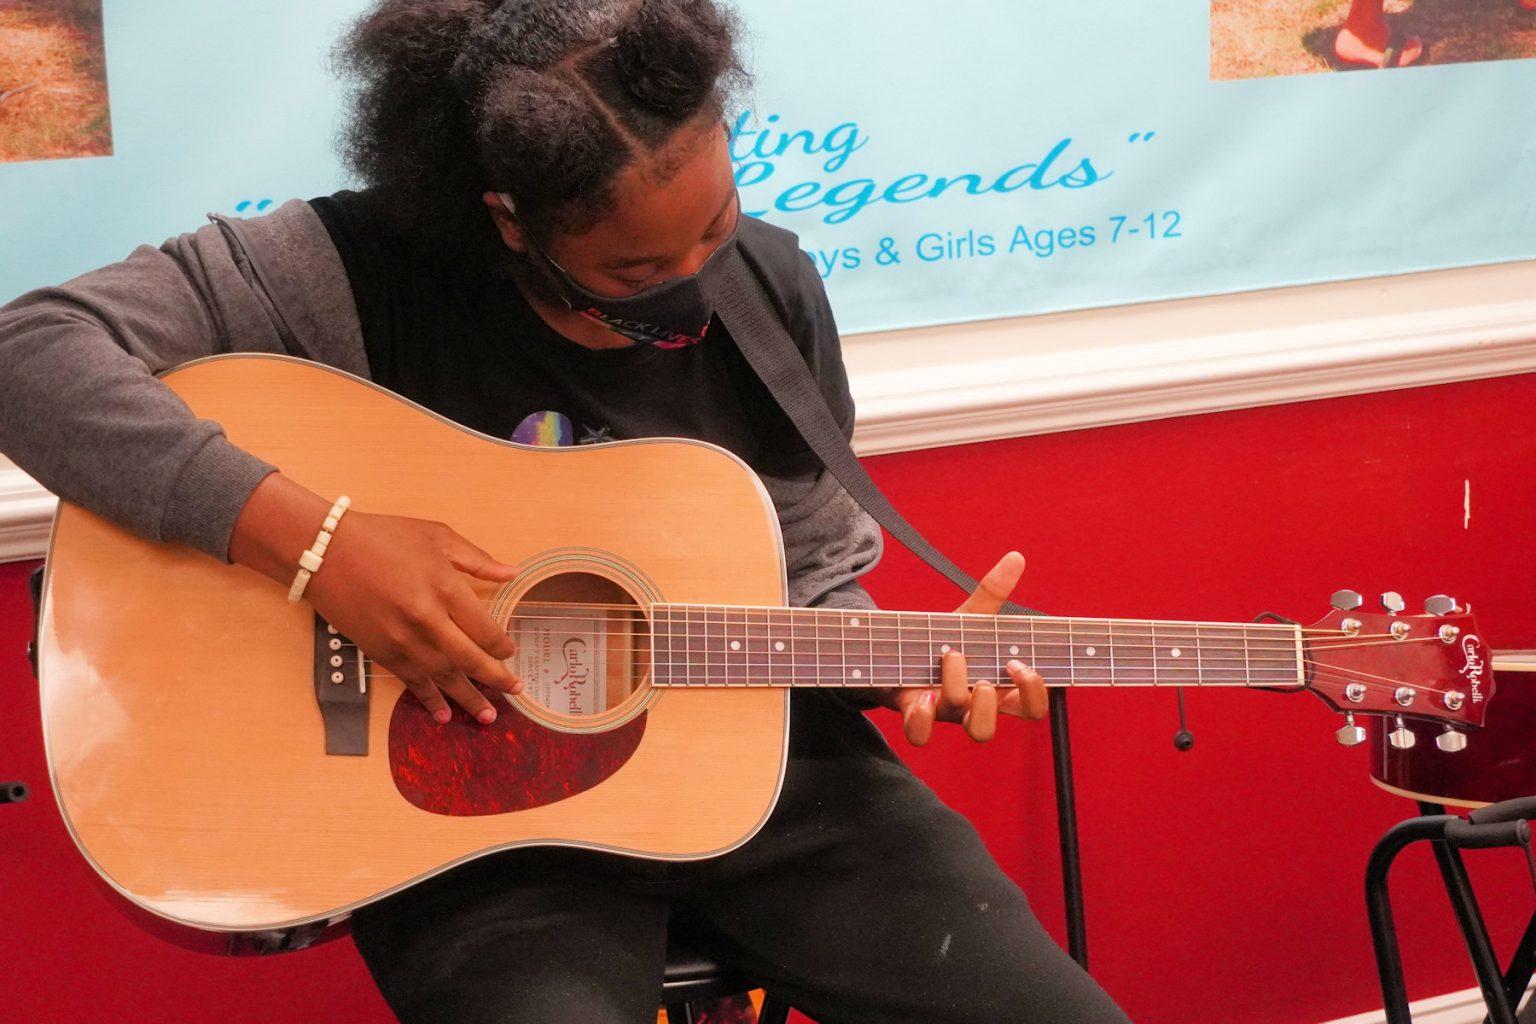 Plucking a hard chord